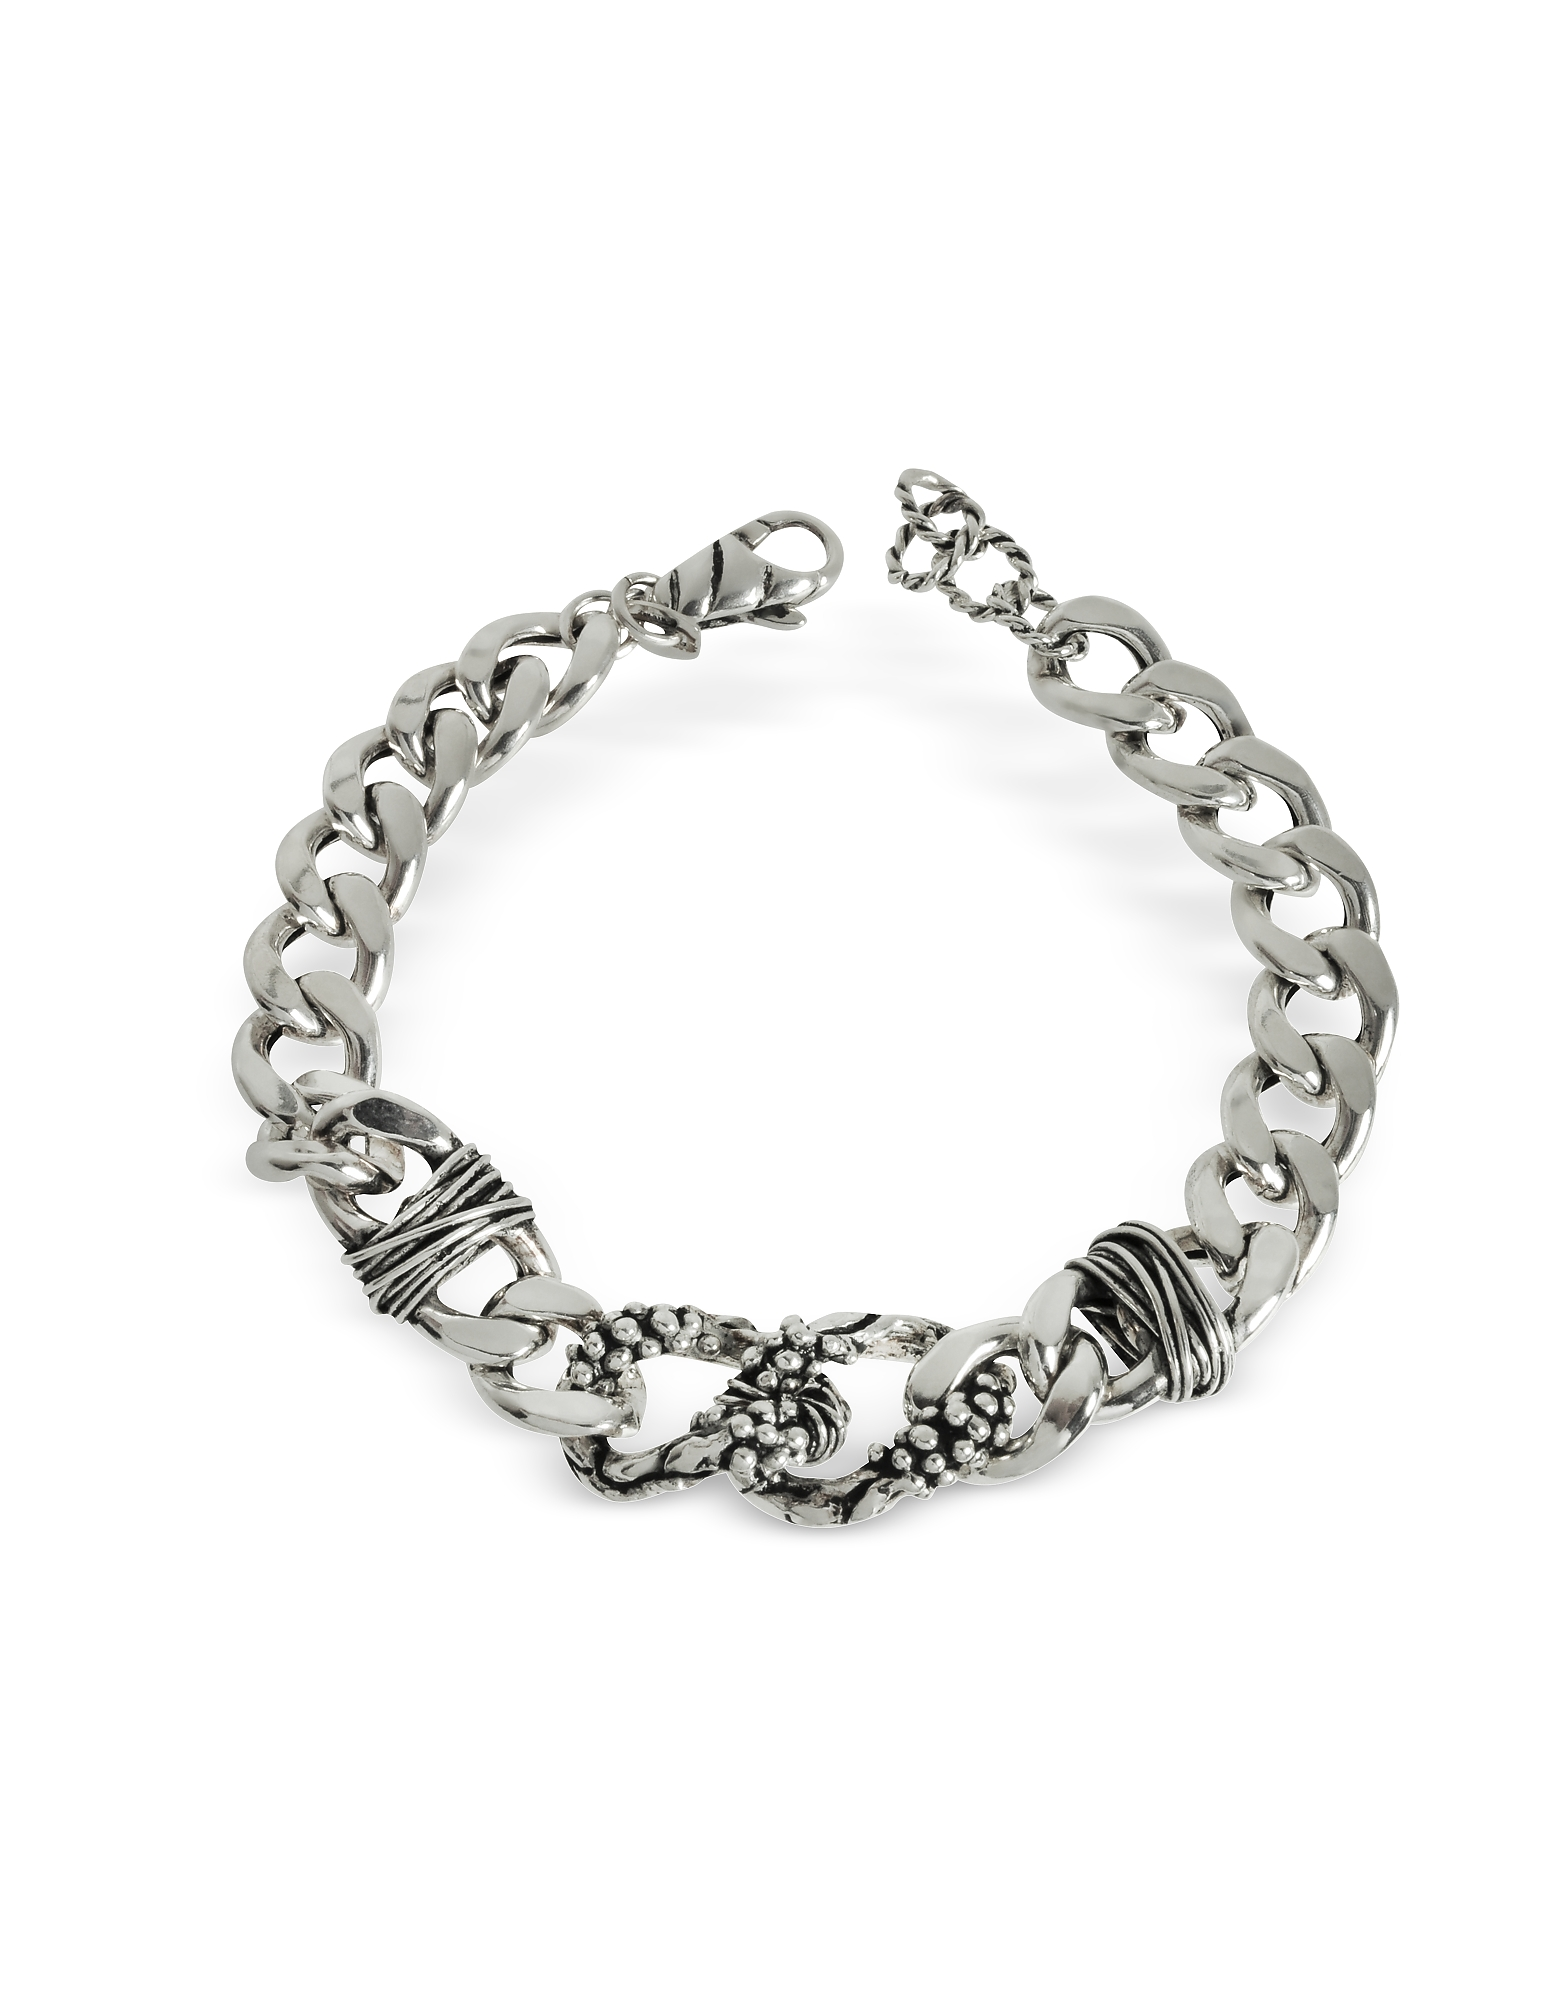 Giacomo Burroni Men's Bracelets, Chain Bracelet w/Etruscan Knots